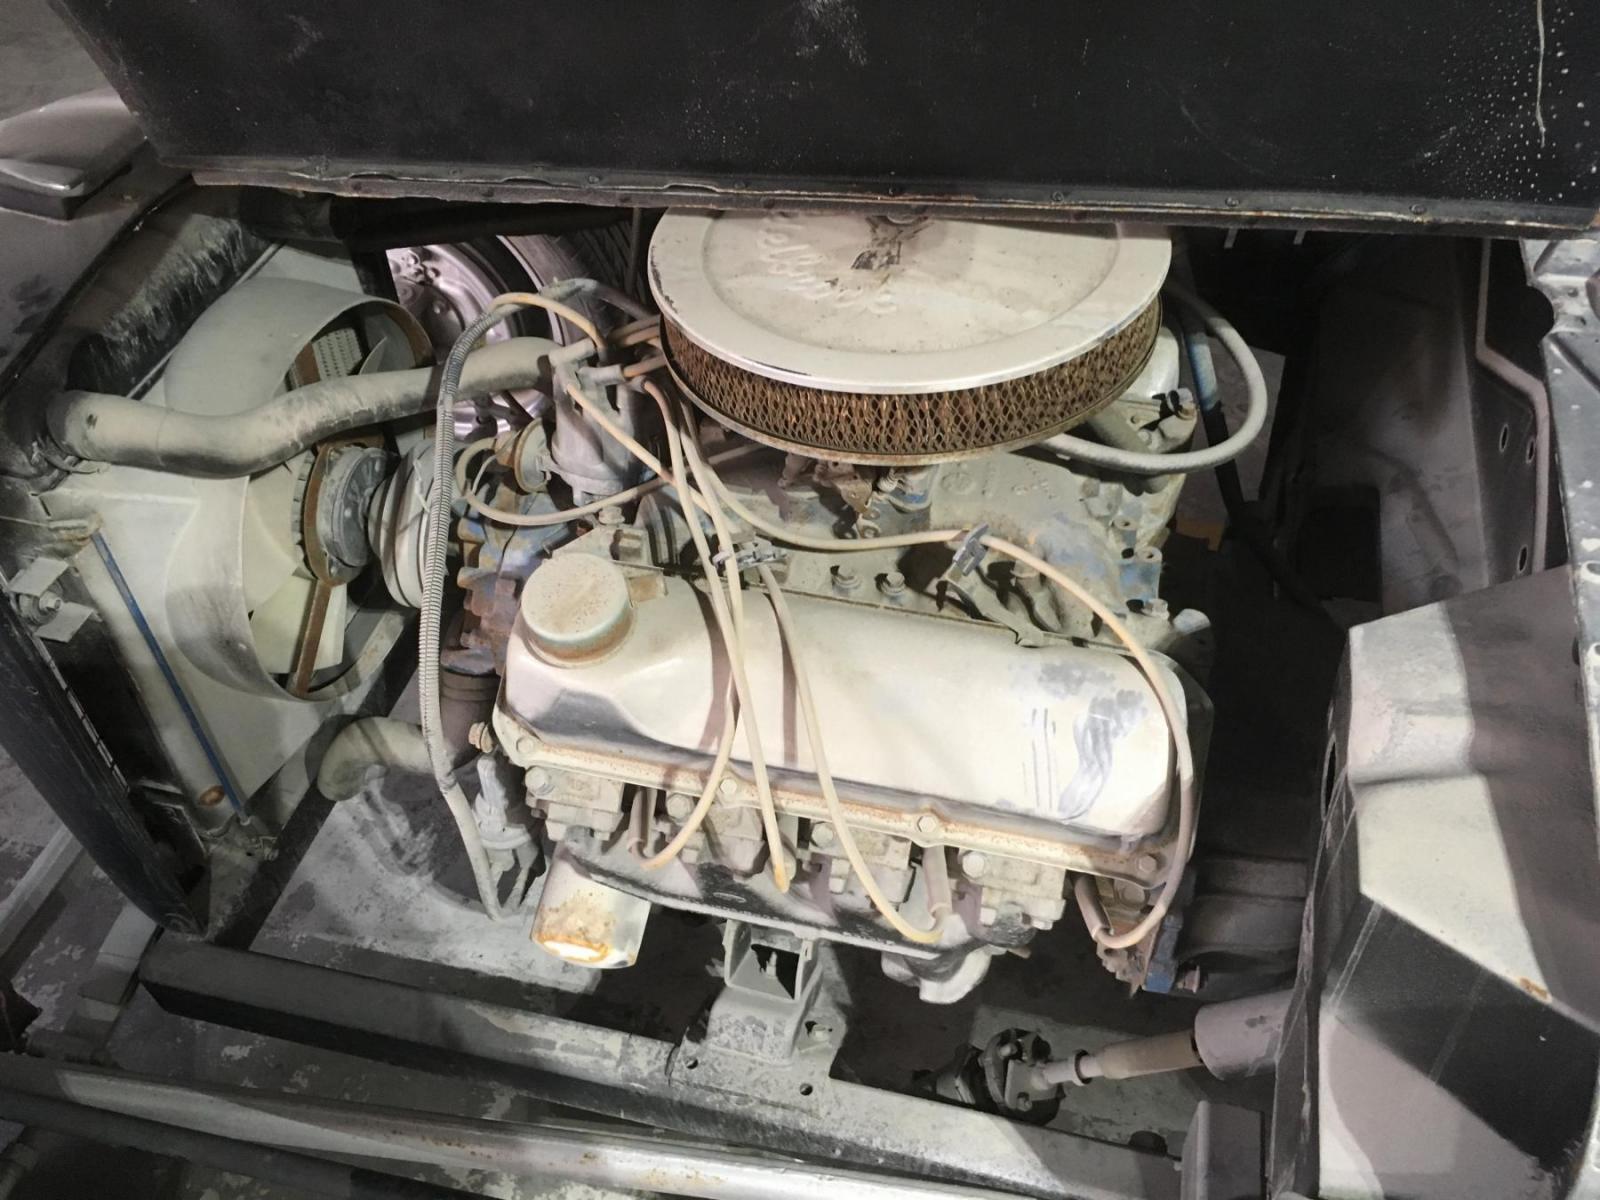 A56E7FF5-B0F4-47A1-BBAC-54F4319C7309.jpeg